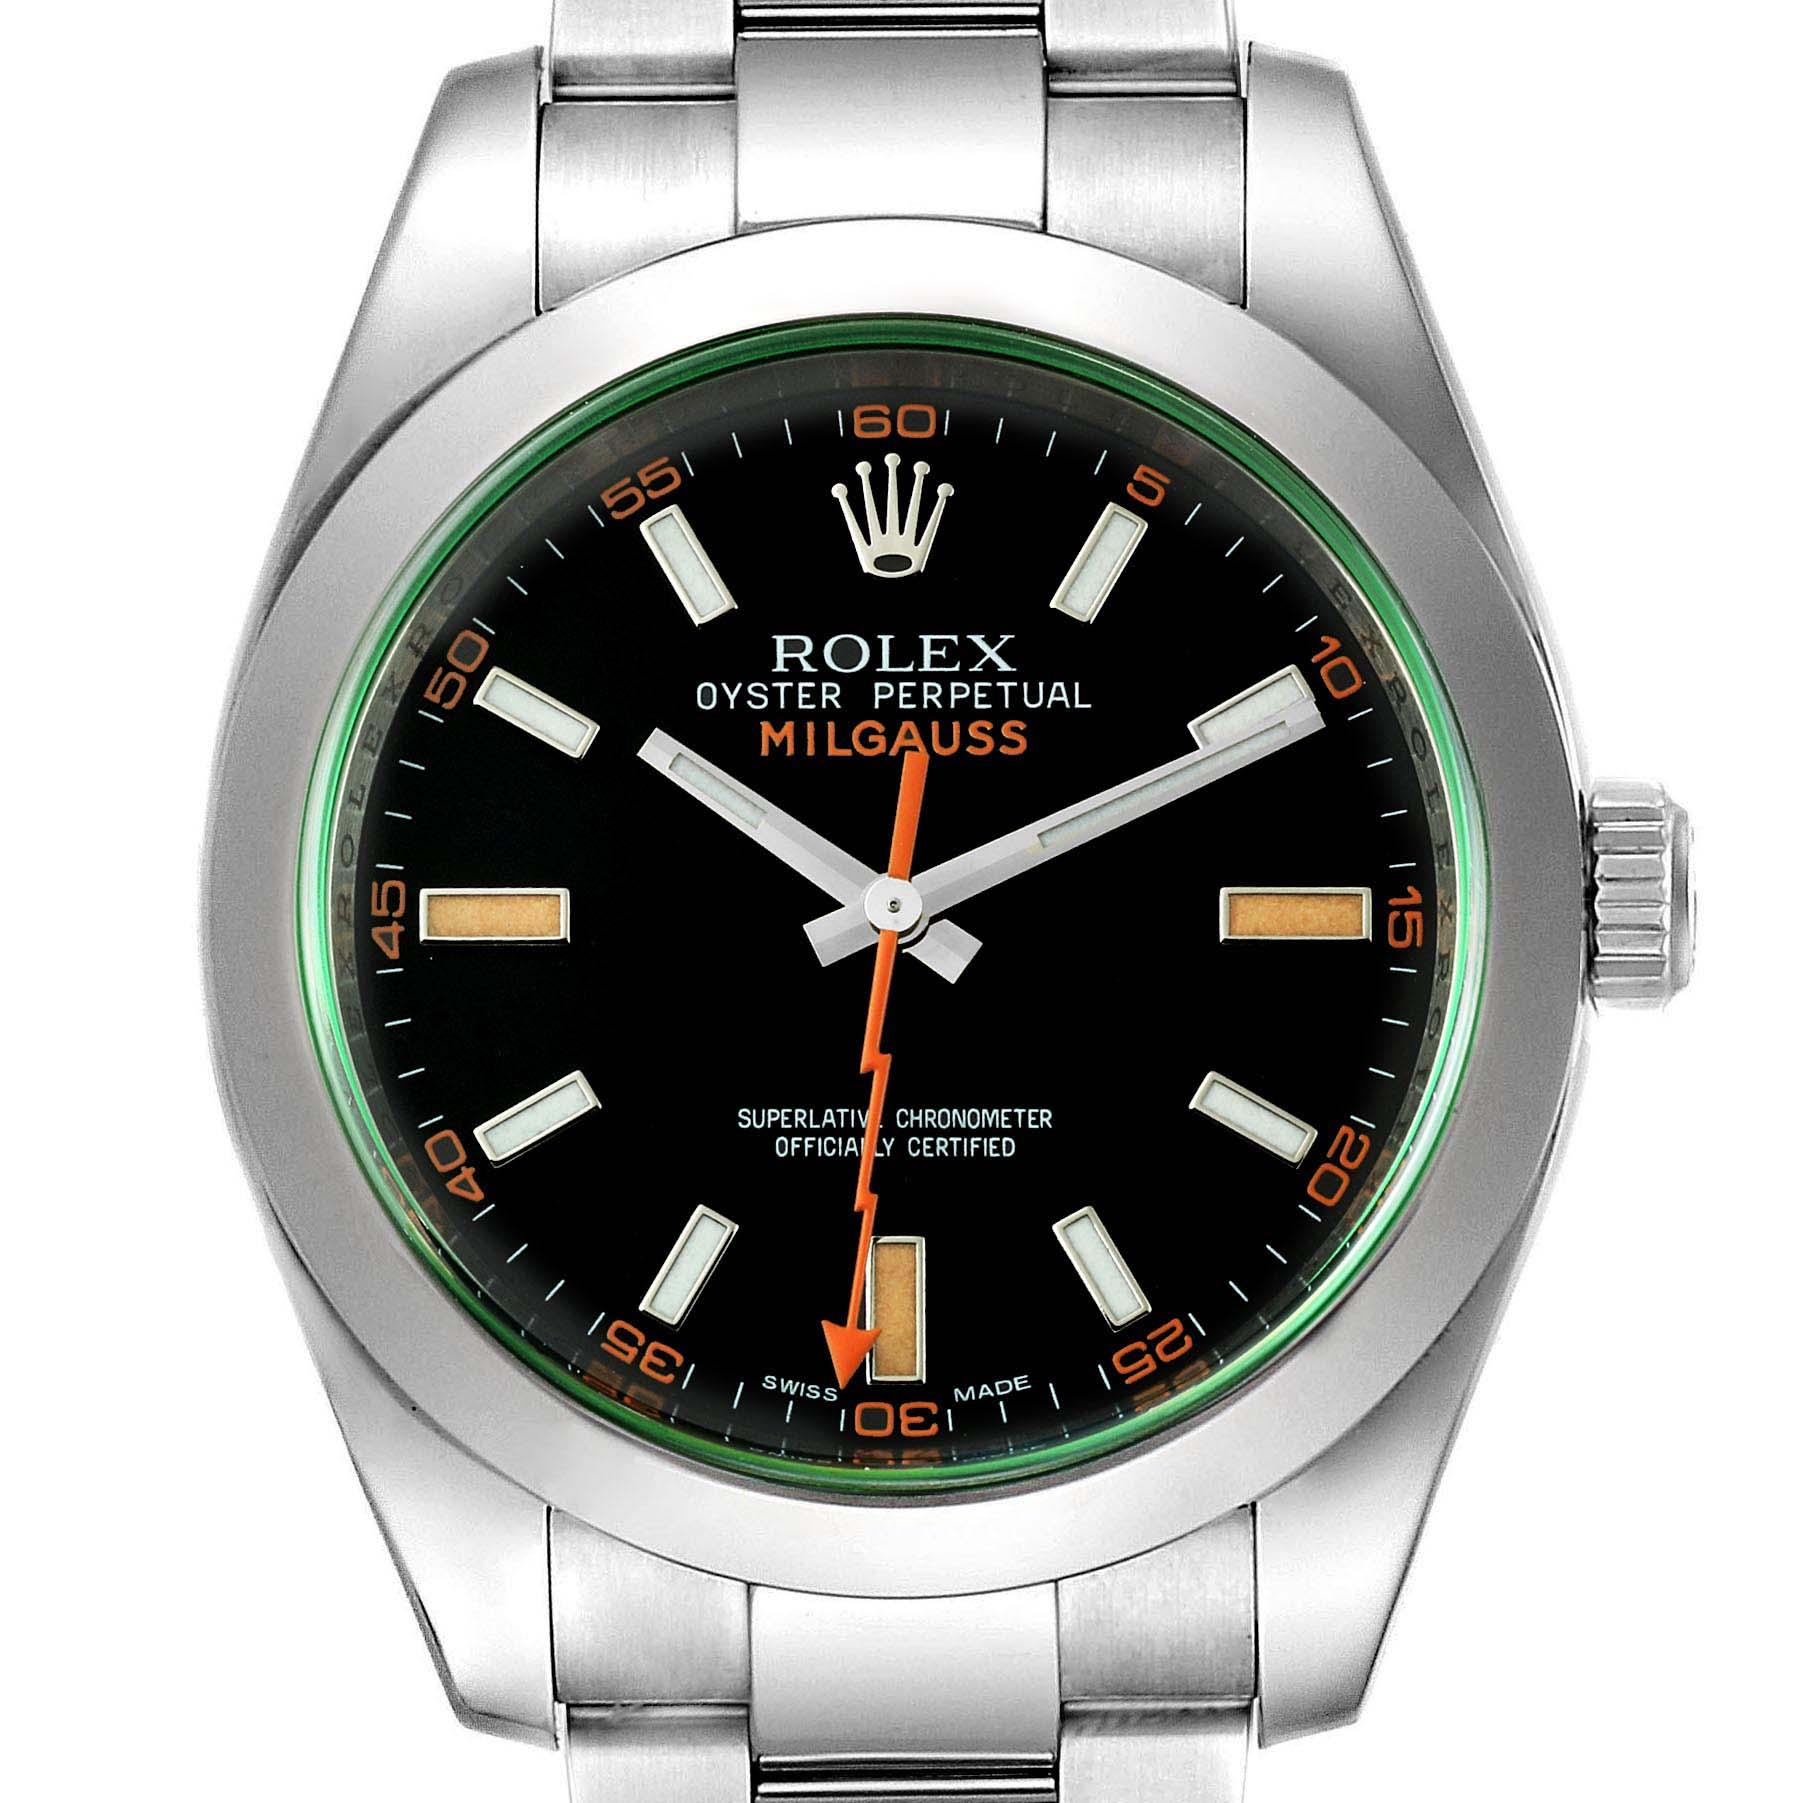 Rolex Milgauss Black Dial Green Crystal Mens Watch 116400GV Box Card